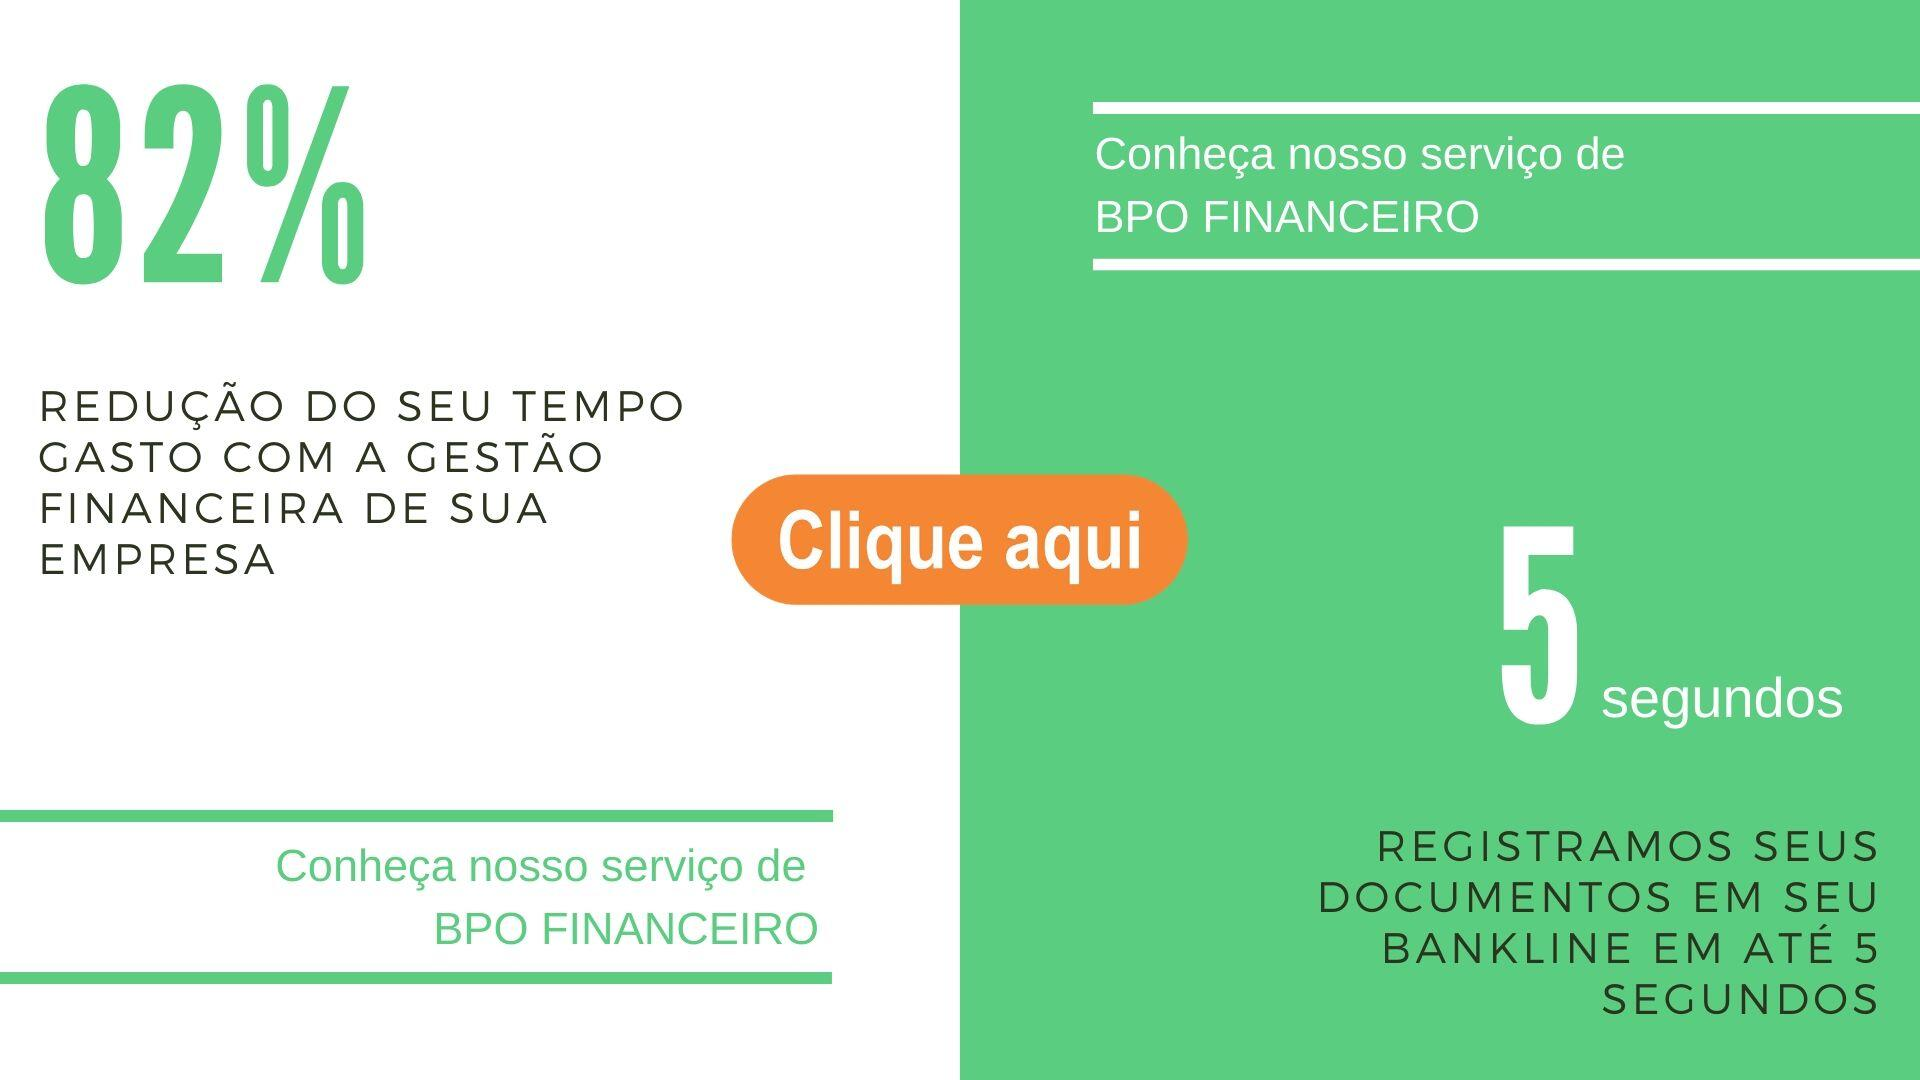 BPO Financeiro - comparativo